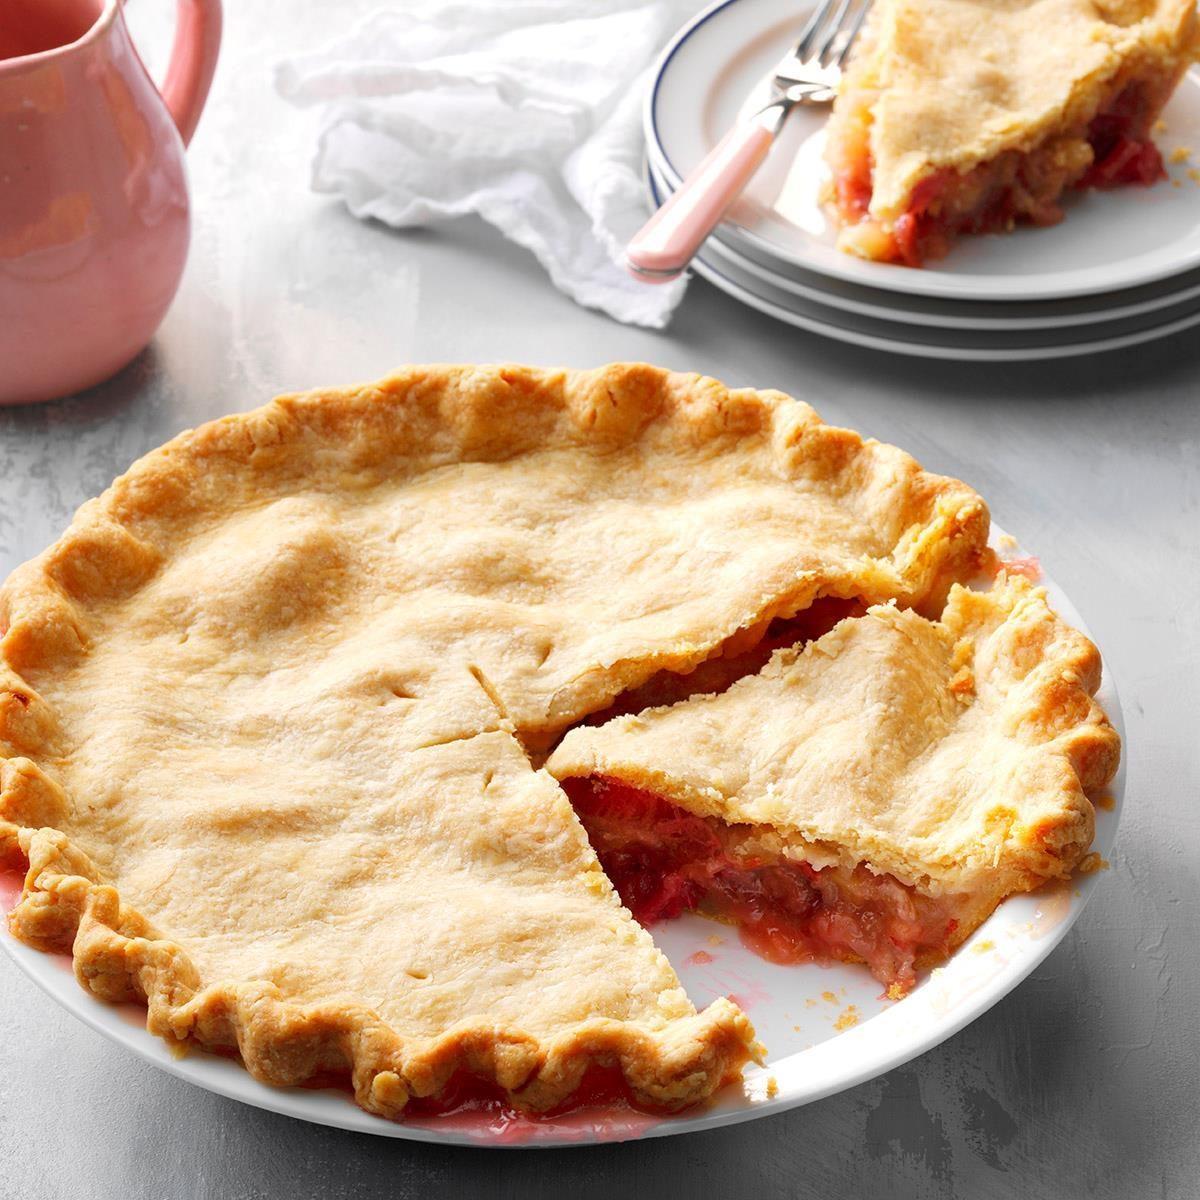 Granny's Rhubarb Pie Recipe | Taste of Home